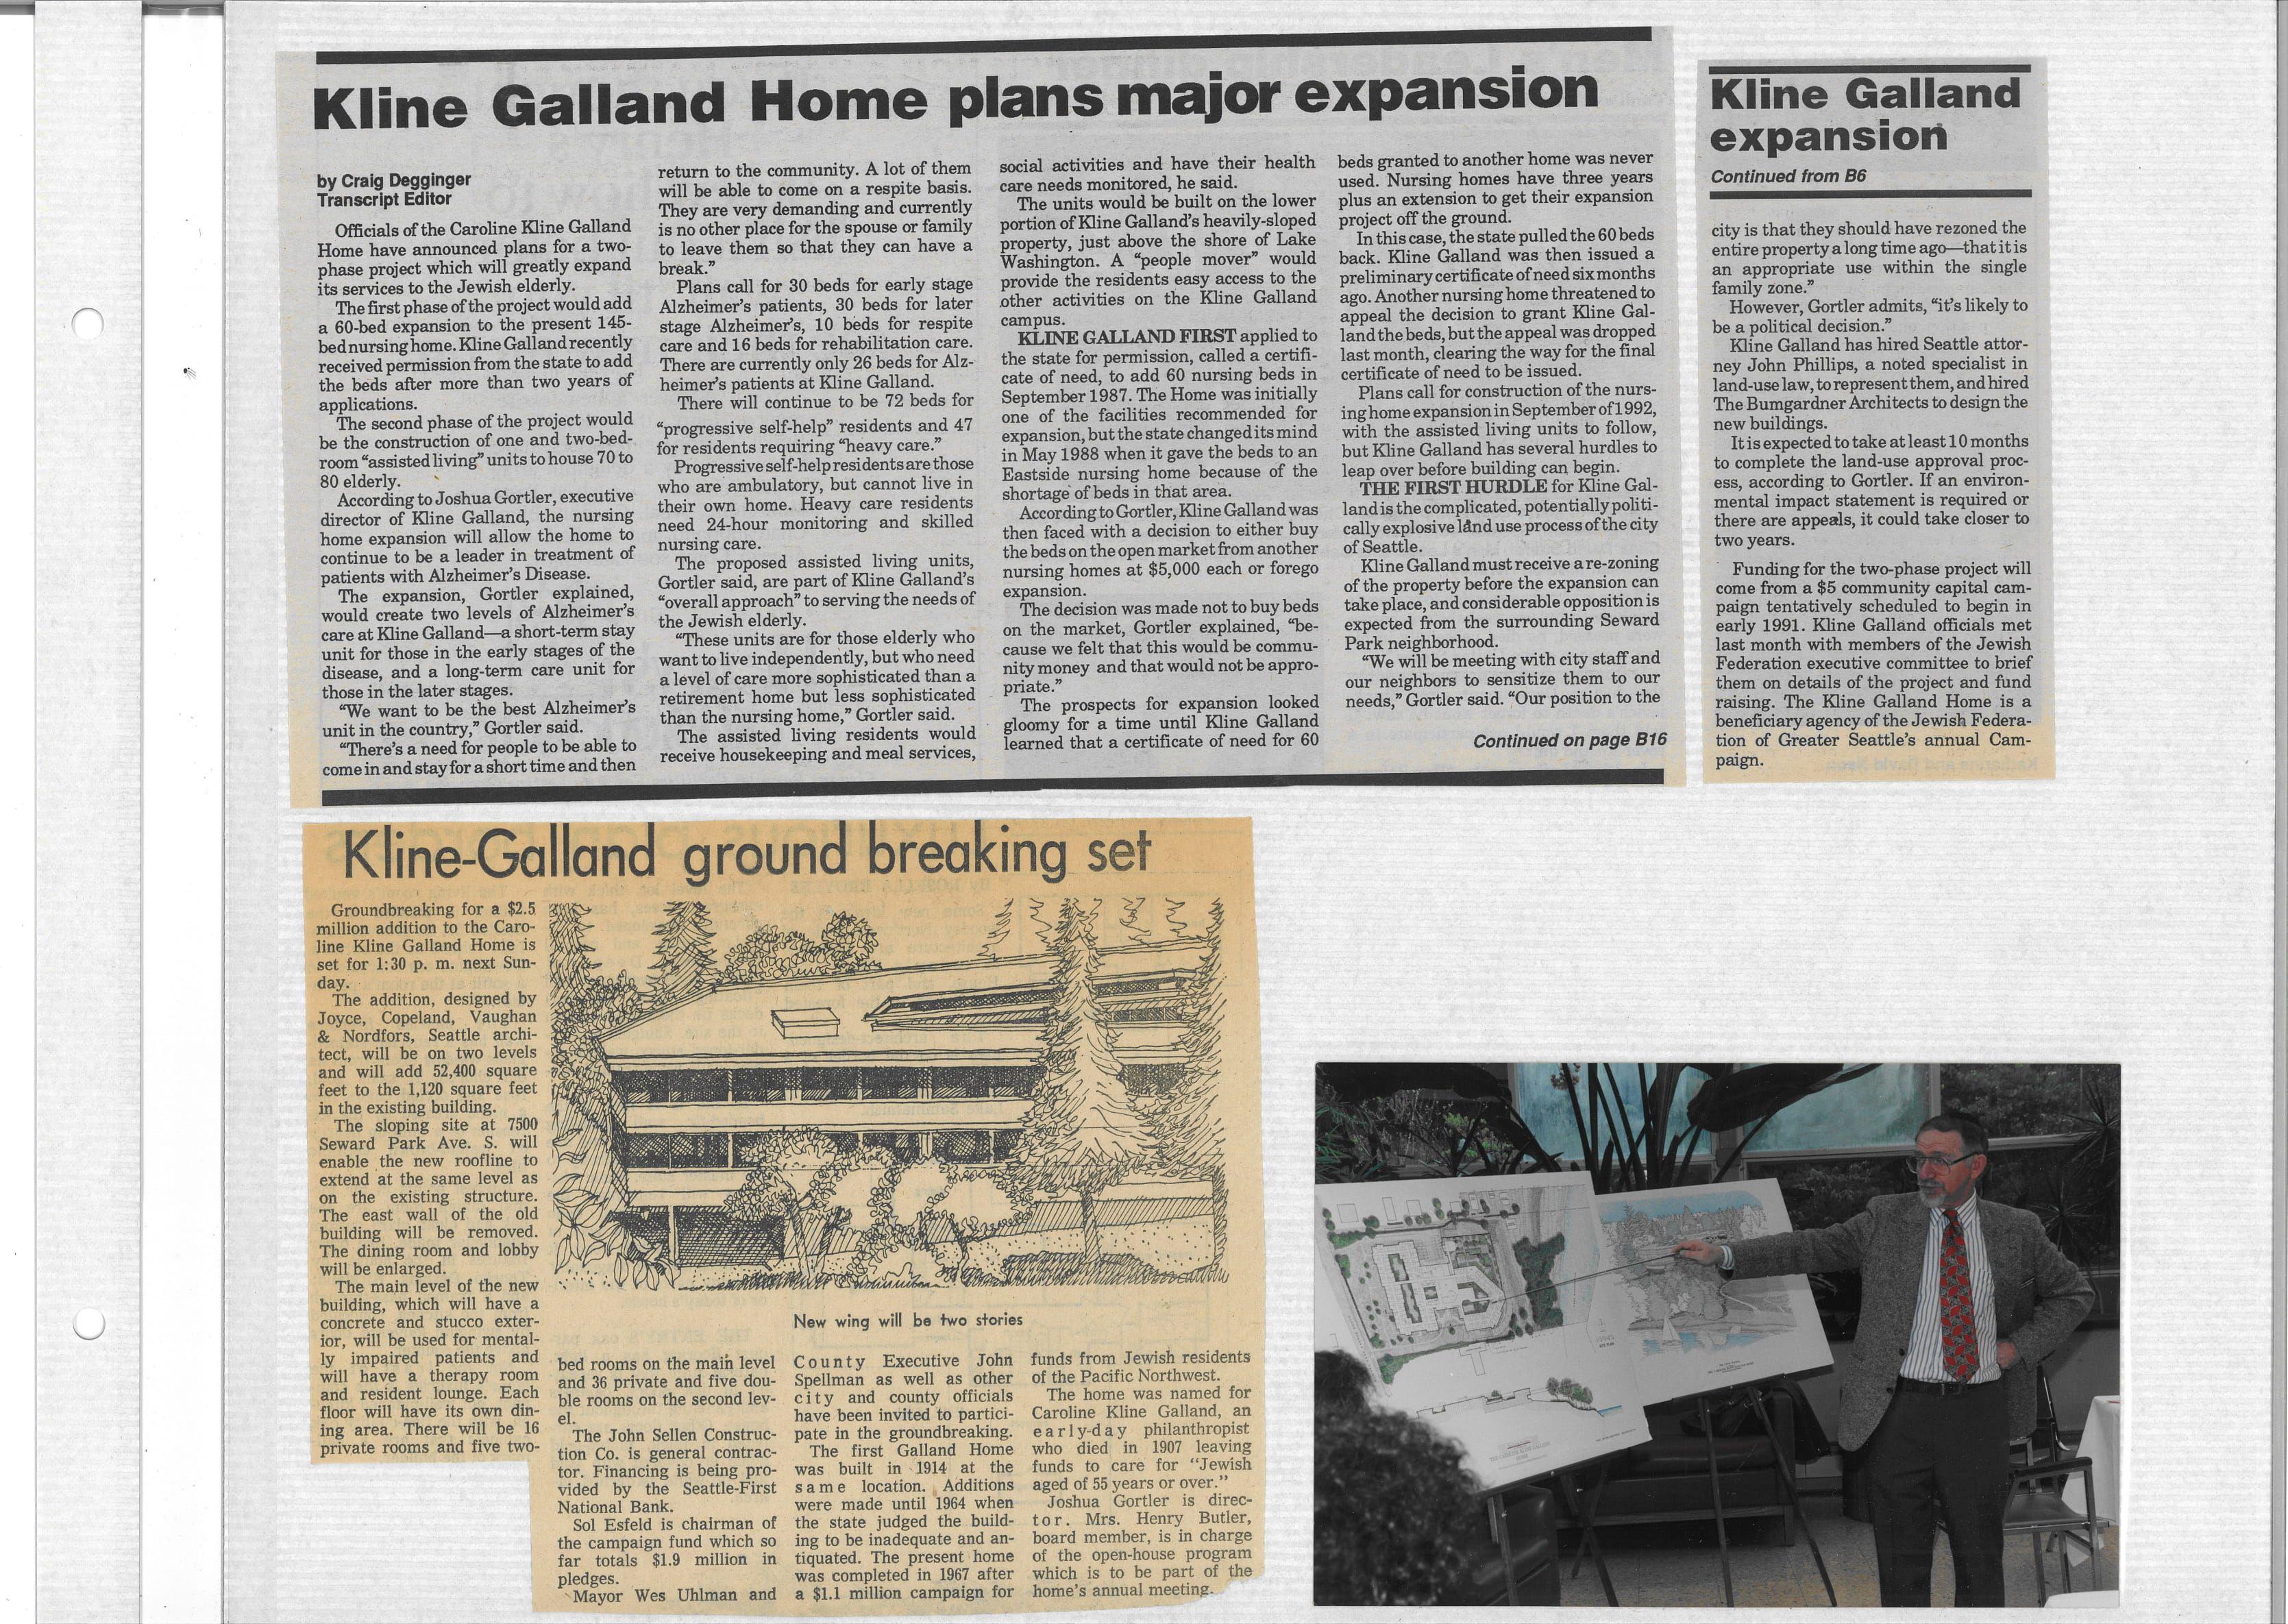 Kline Galland plans major expansion